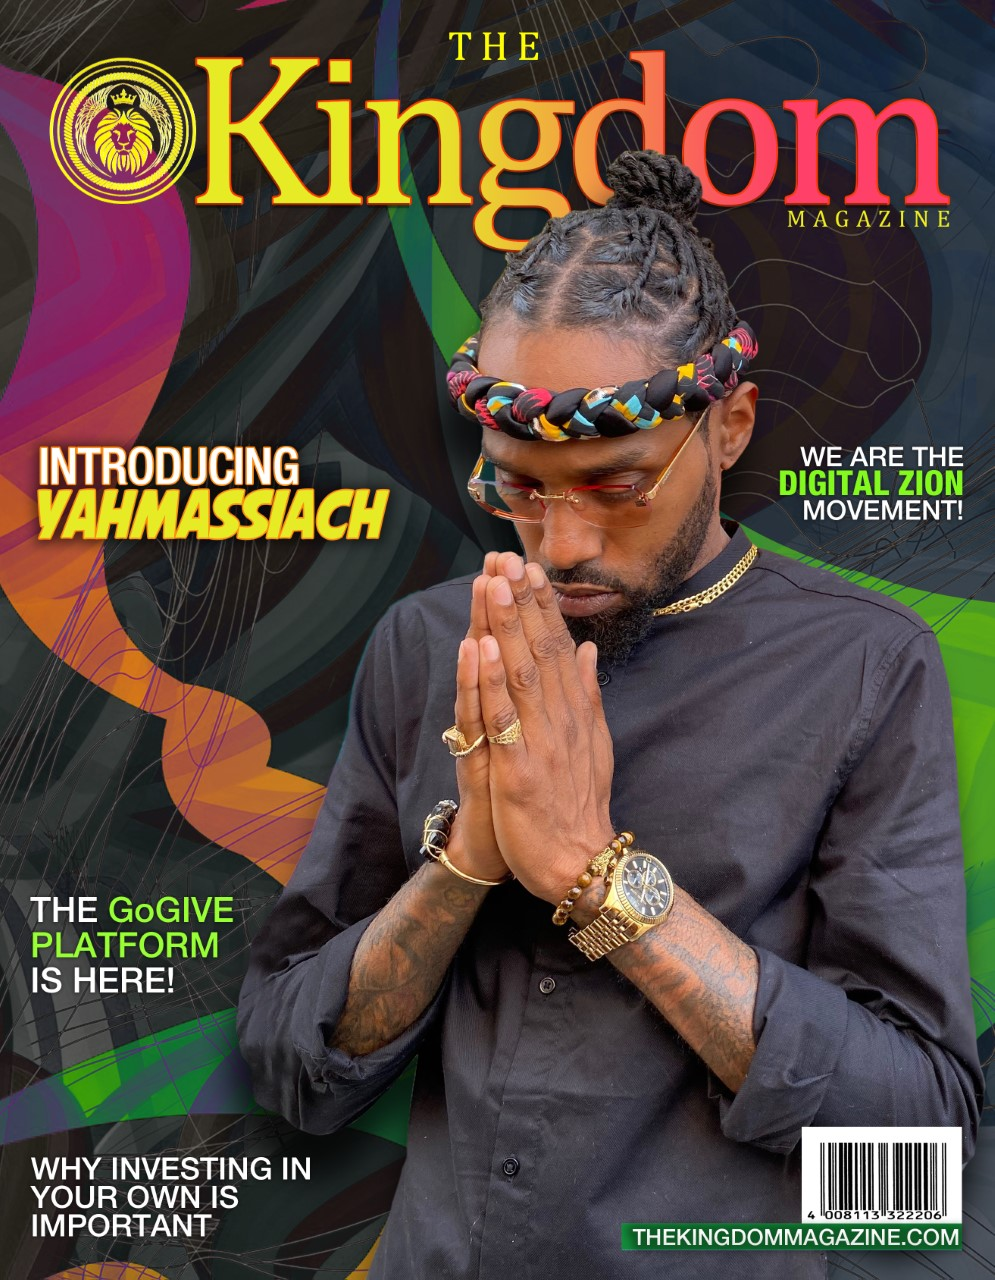 The Kingdom Magazine